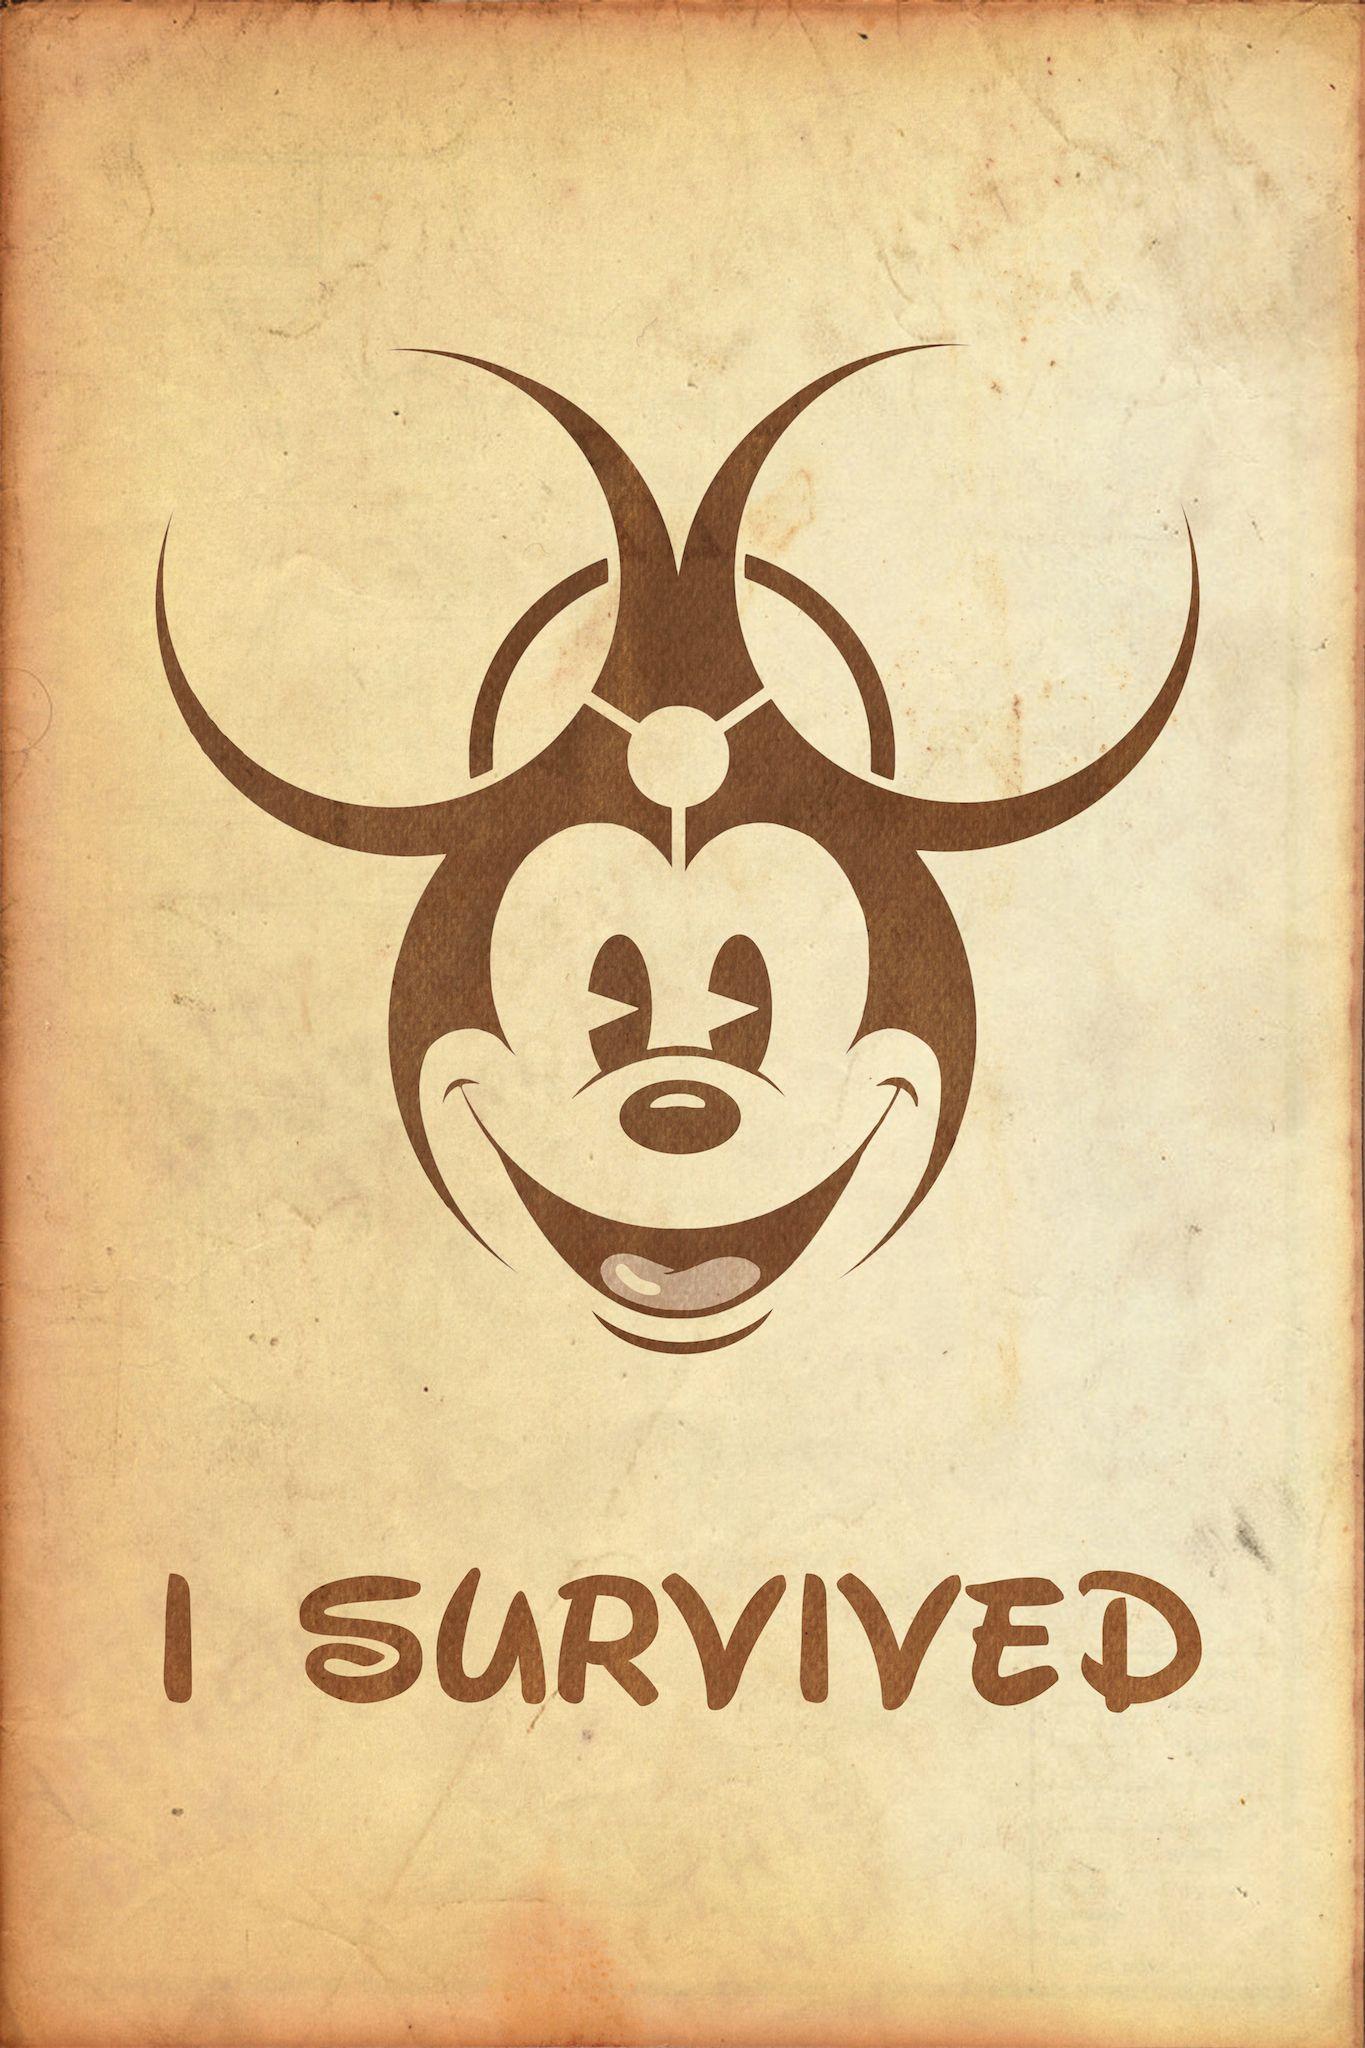 In Commemoration Of The 2013 Calarts Norovirus Epidemic #Calarts #Disney